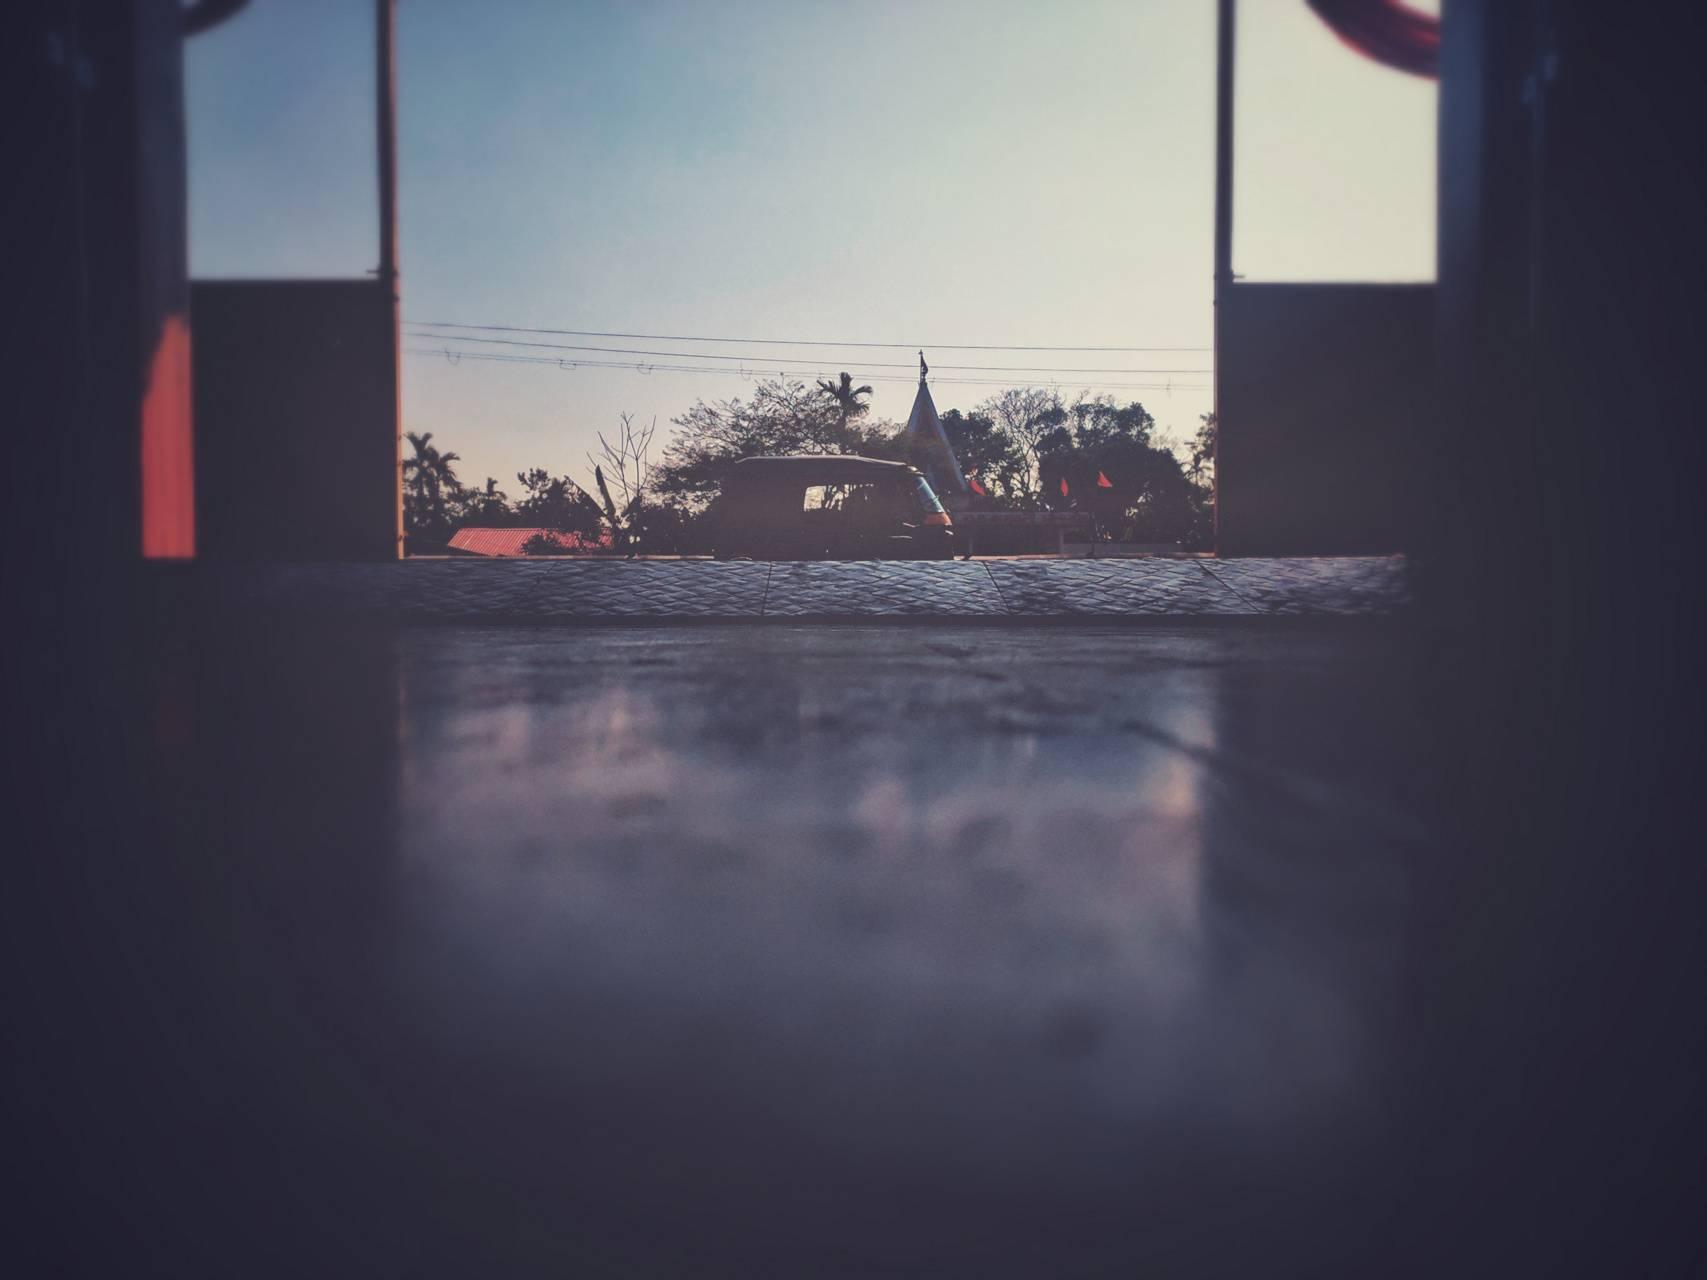 Mid evening